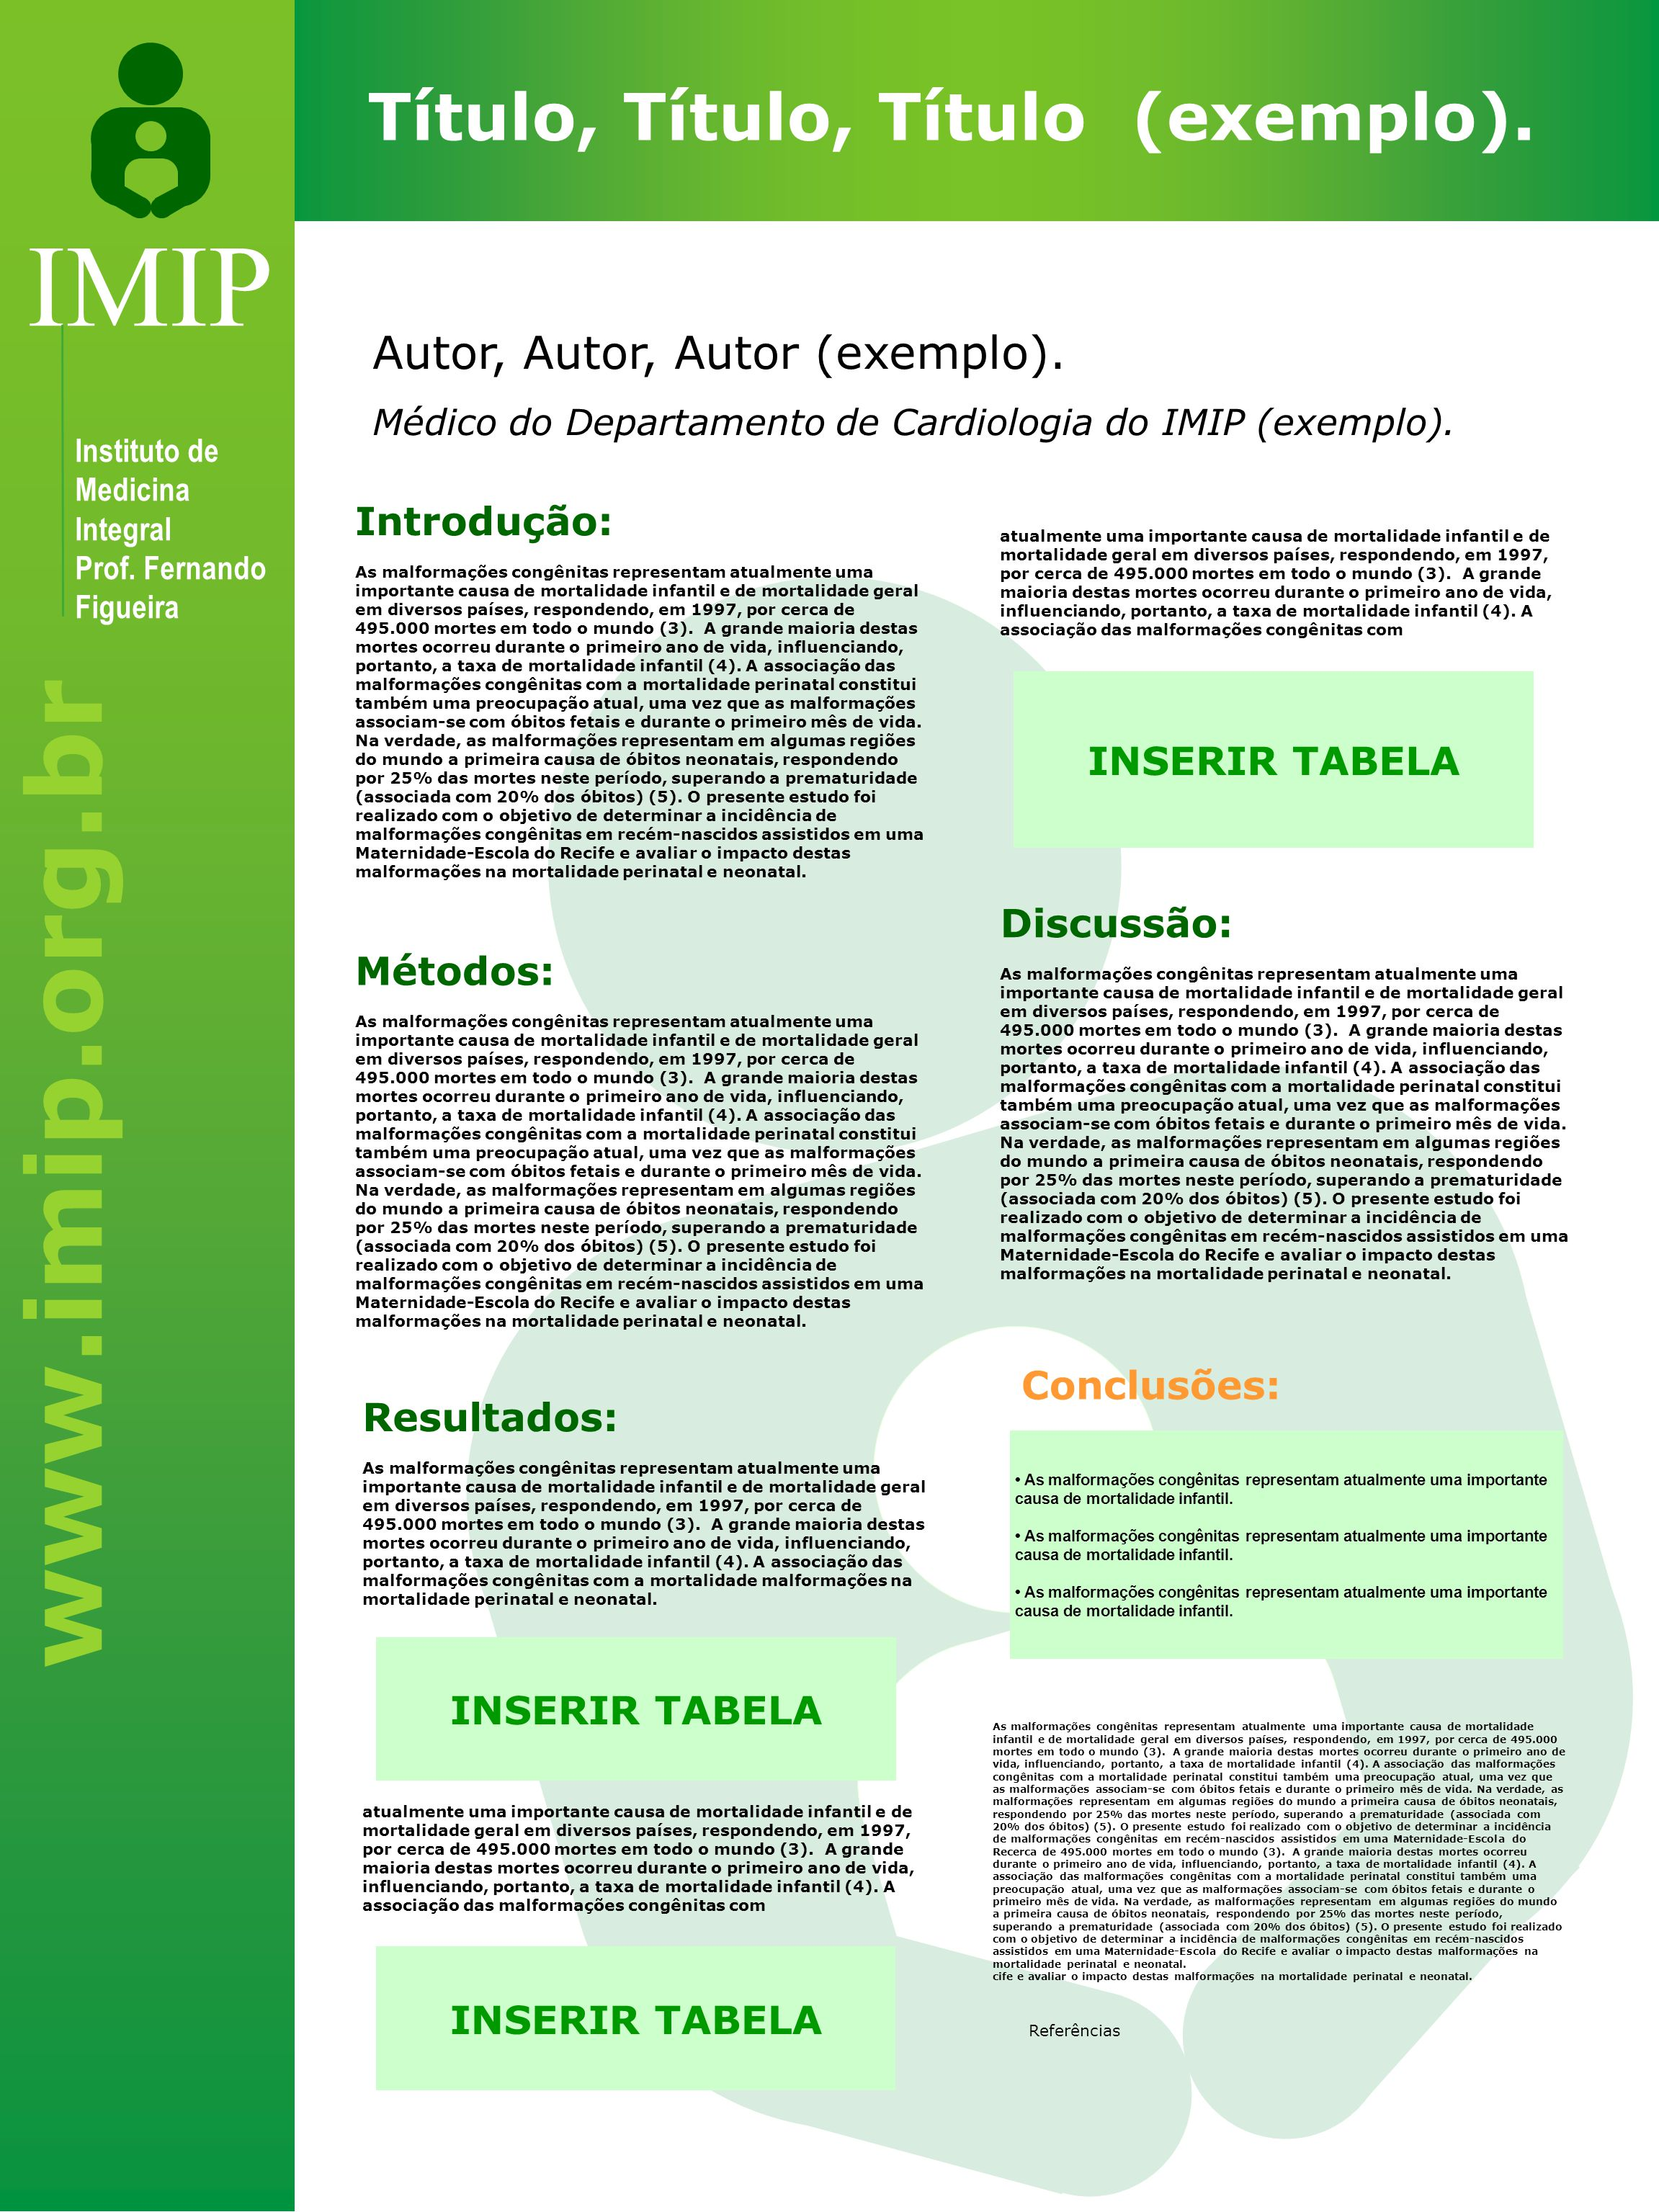 www.imip.org.br IMIP Instituto de Medicina Integral Prof. Fernando Figueira Título, Título, Título (exemplo). Introdução: As malformações congênitas r